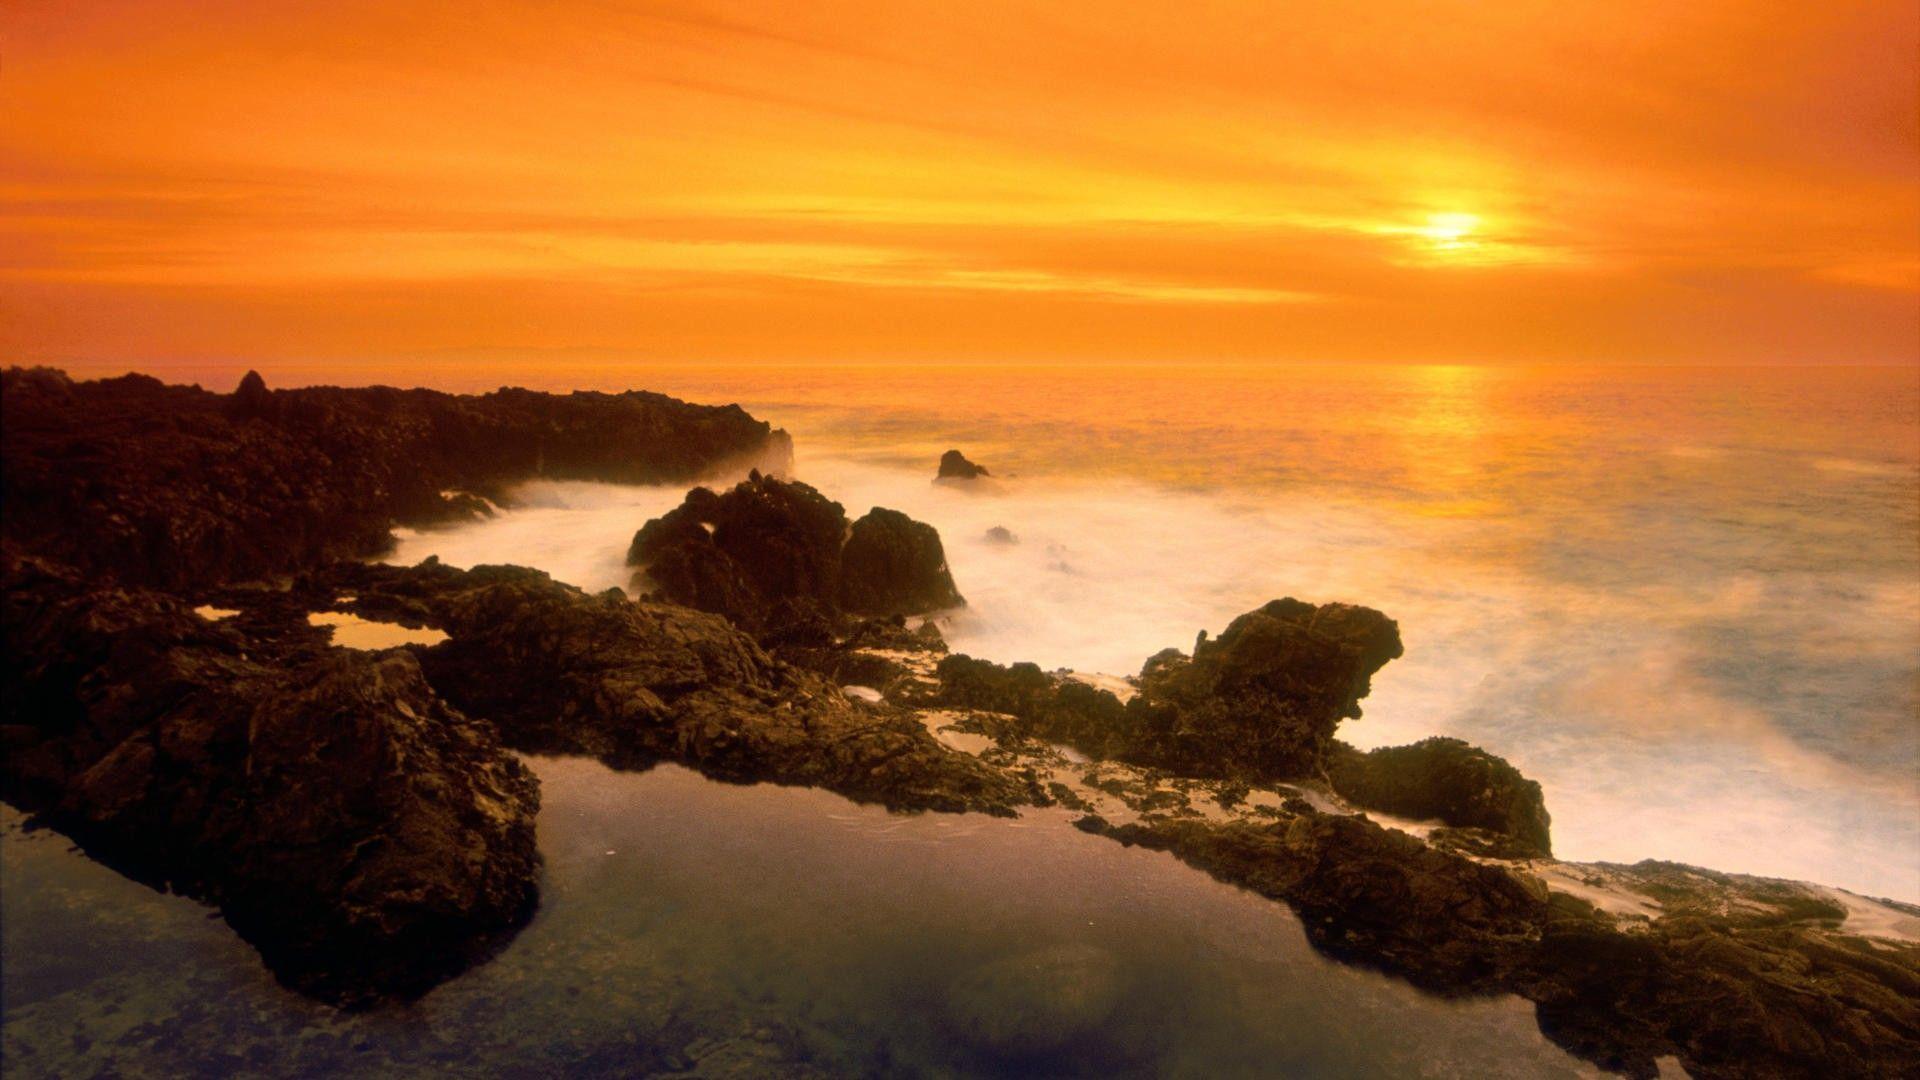 Beautiful Wallpaper Laptop Sunset - 3a369dabc6c1aceb9ccb3eb0e33abb76  Best Photo Reference_2939.jpg